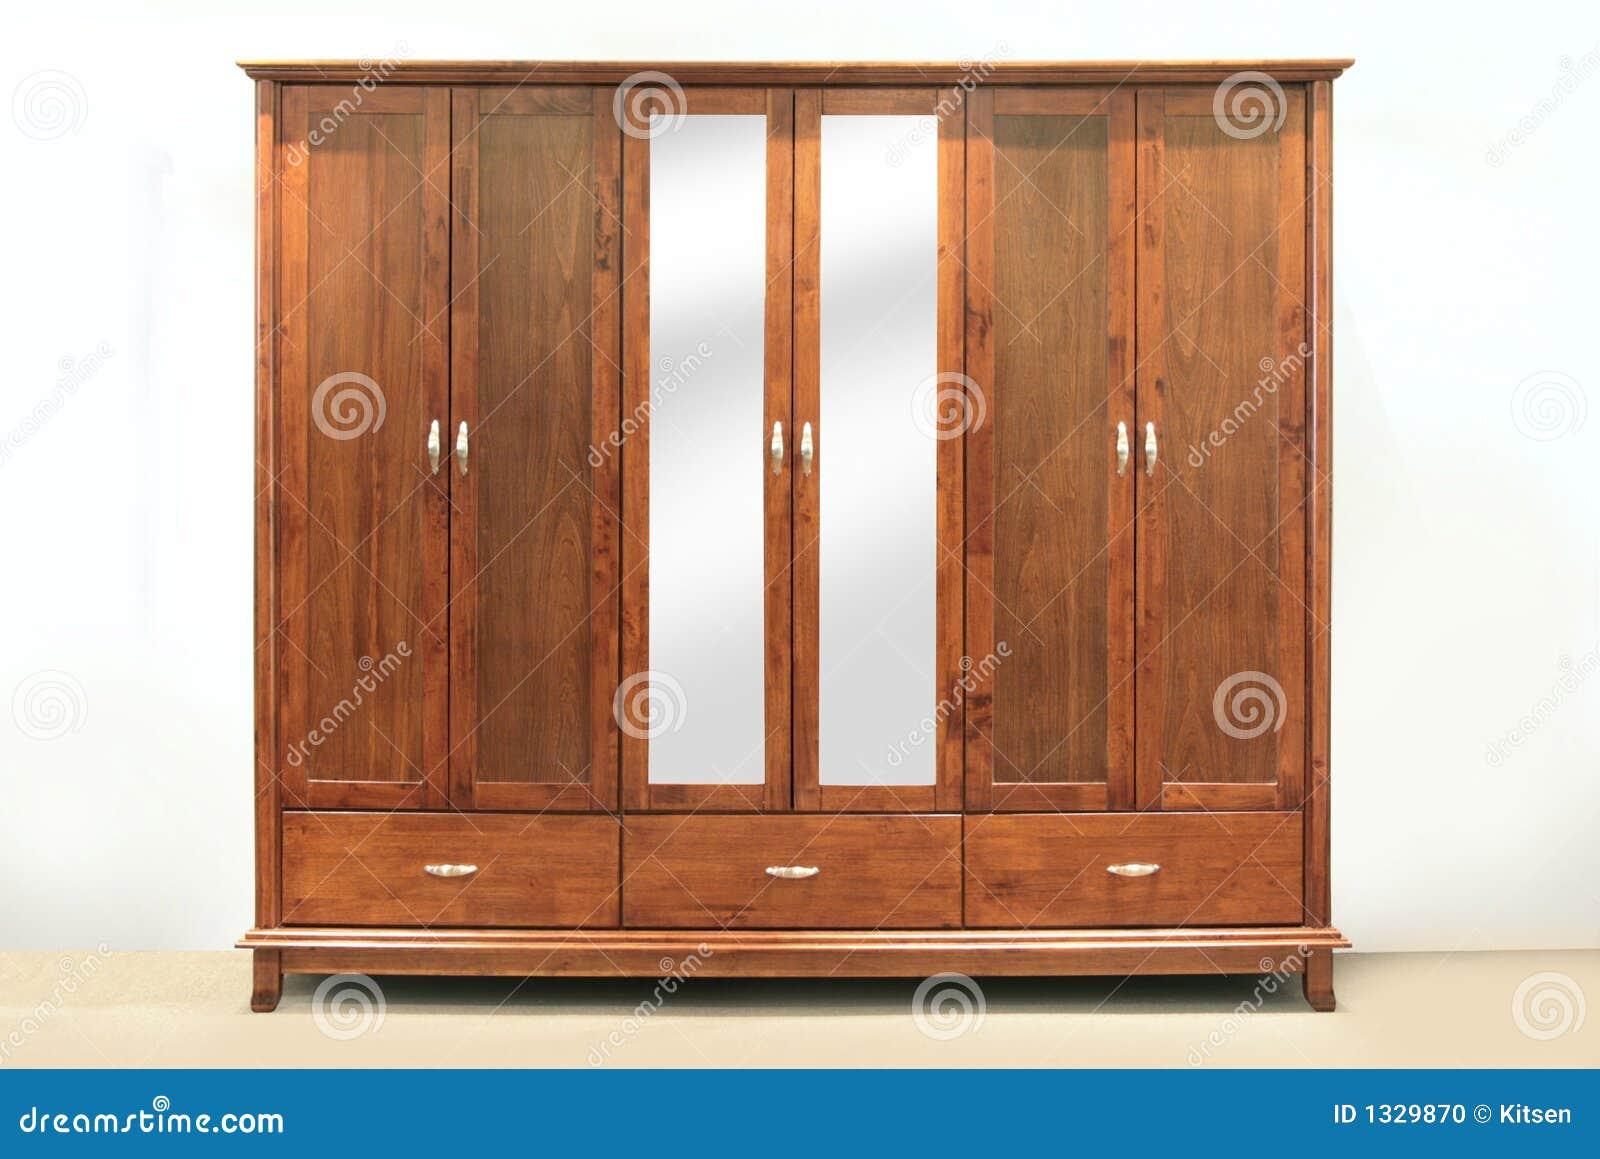 gro e garderobe stockfoto bild 1329870. Black Bedroom Furniture Sets. Home Design Ideas